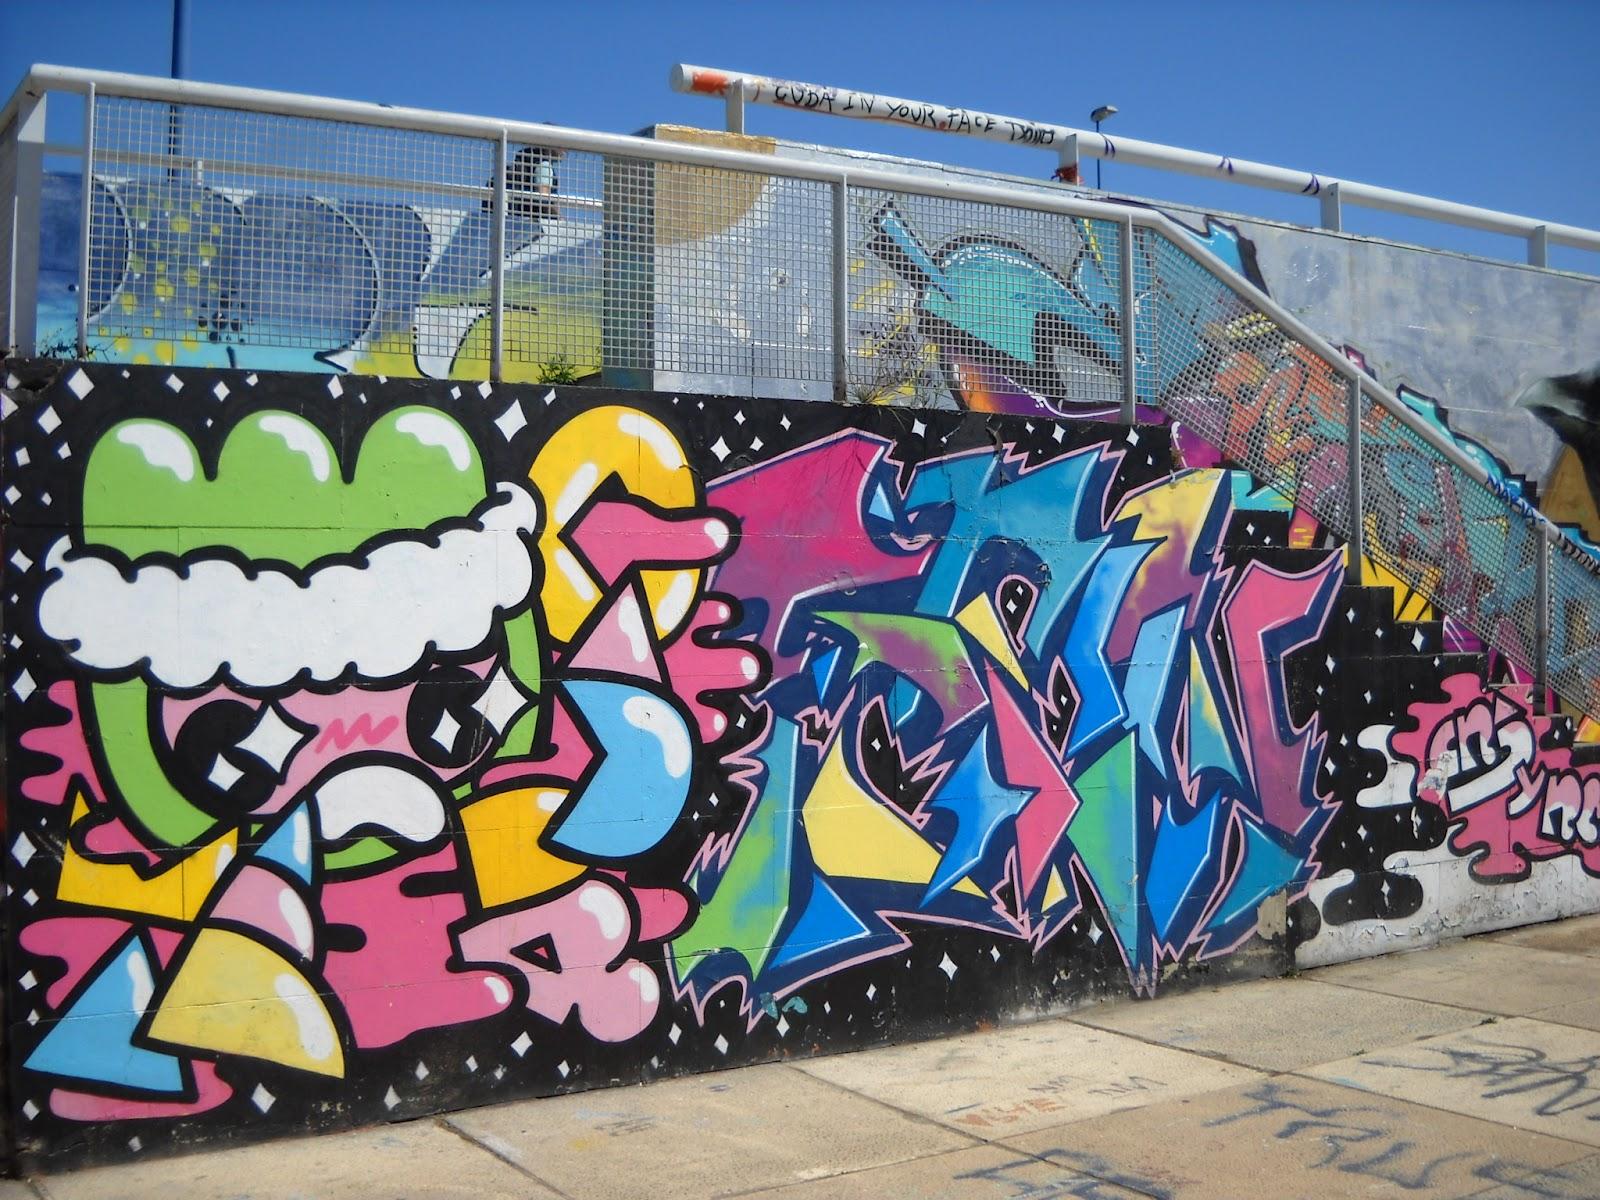 El museo del graffiti graffitis en skate park plaza de armas graffitis en skate park plaza de armas altavistaventures Image collections